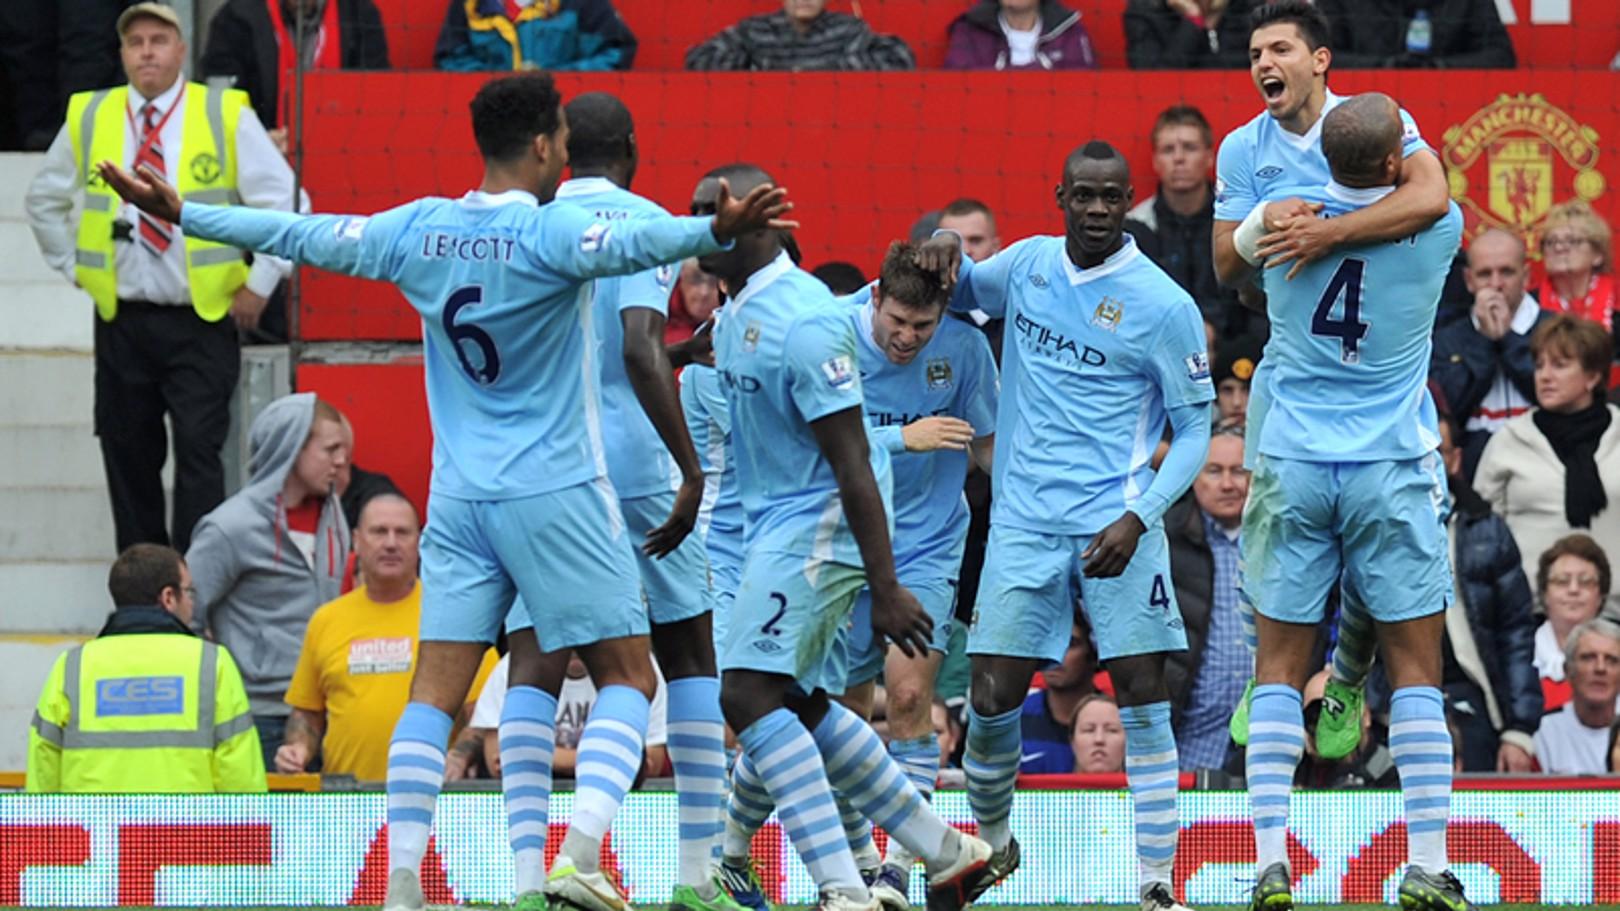 Team celebrate